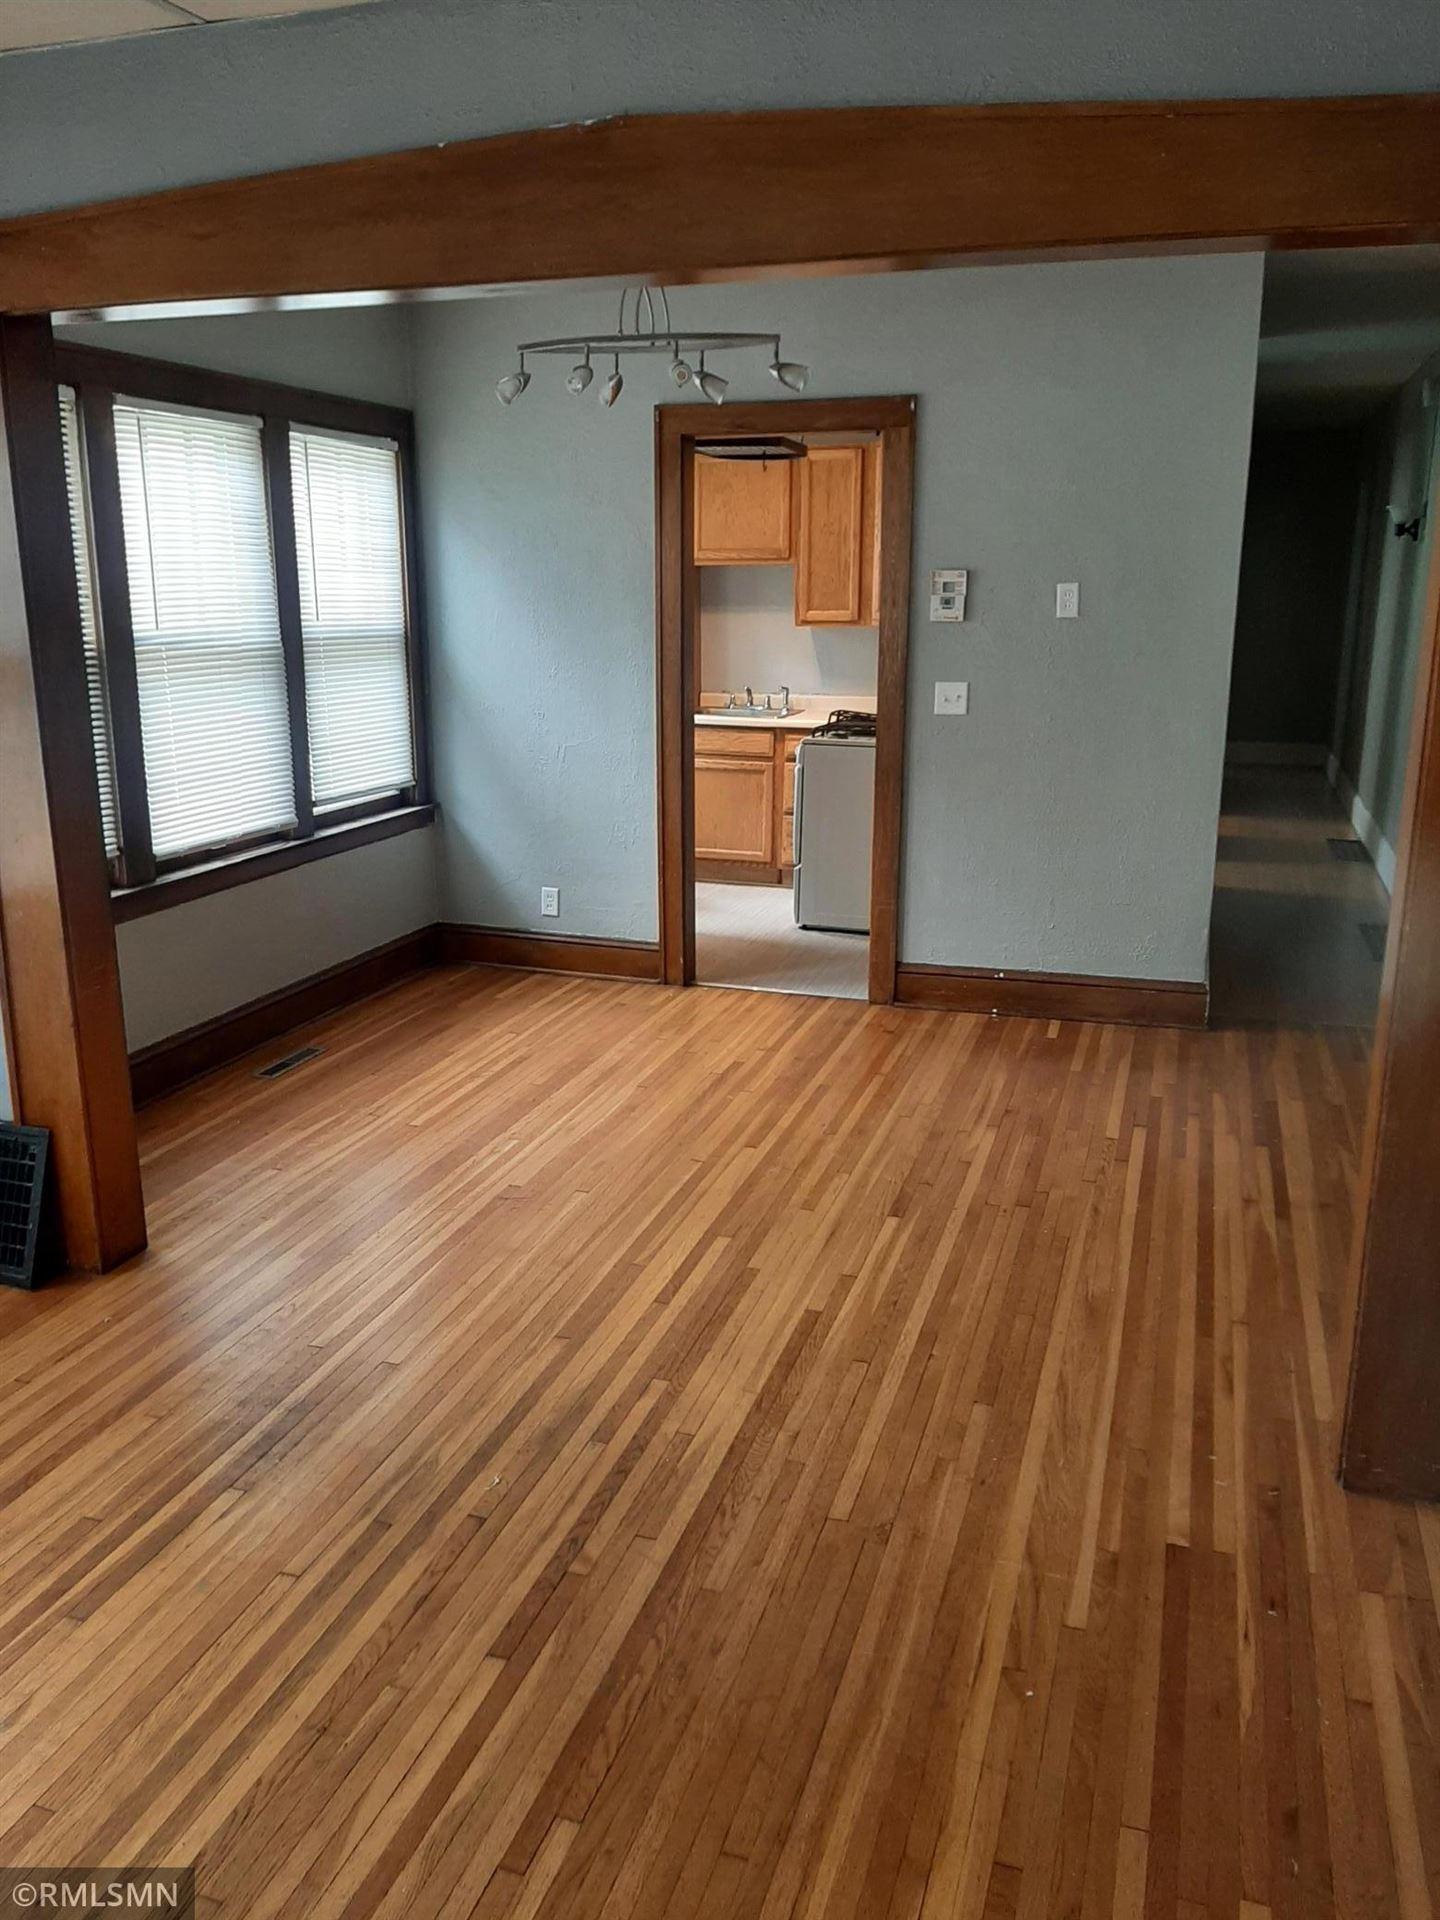 Photo of 4613 Garfield Avenue, Minneapolis, MN 55419 (MLS # 6017305)